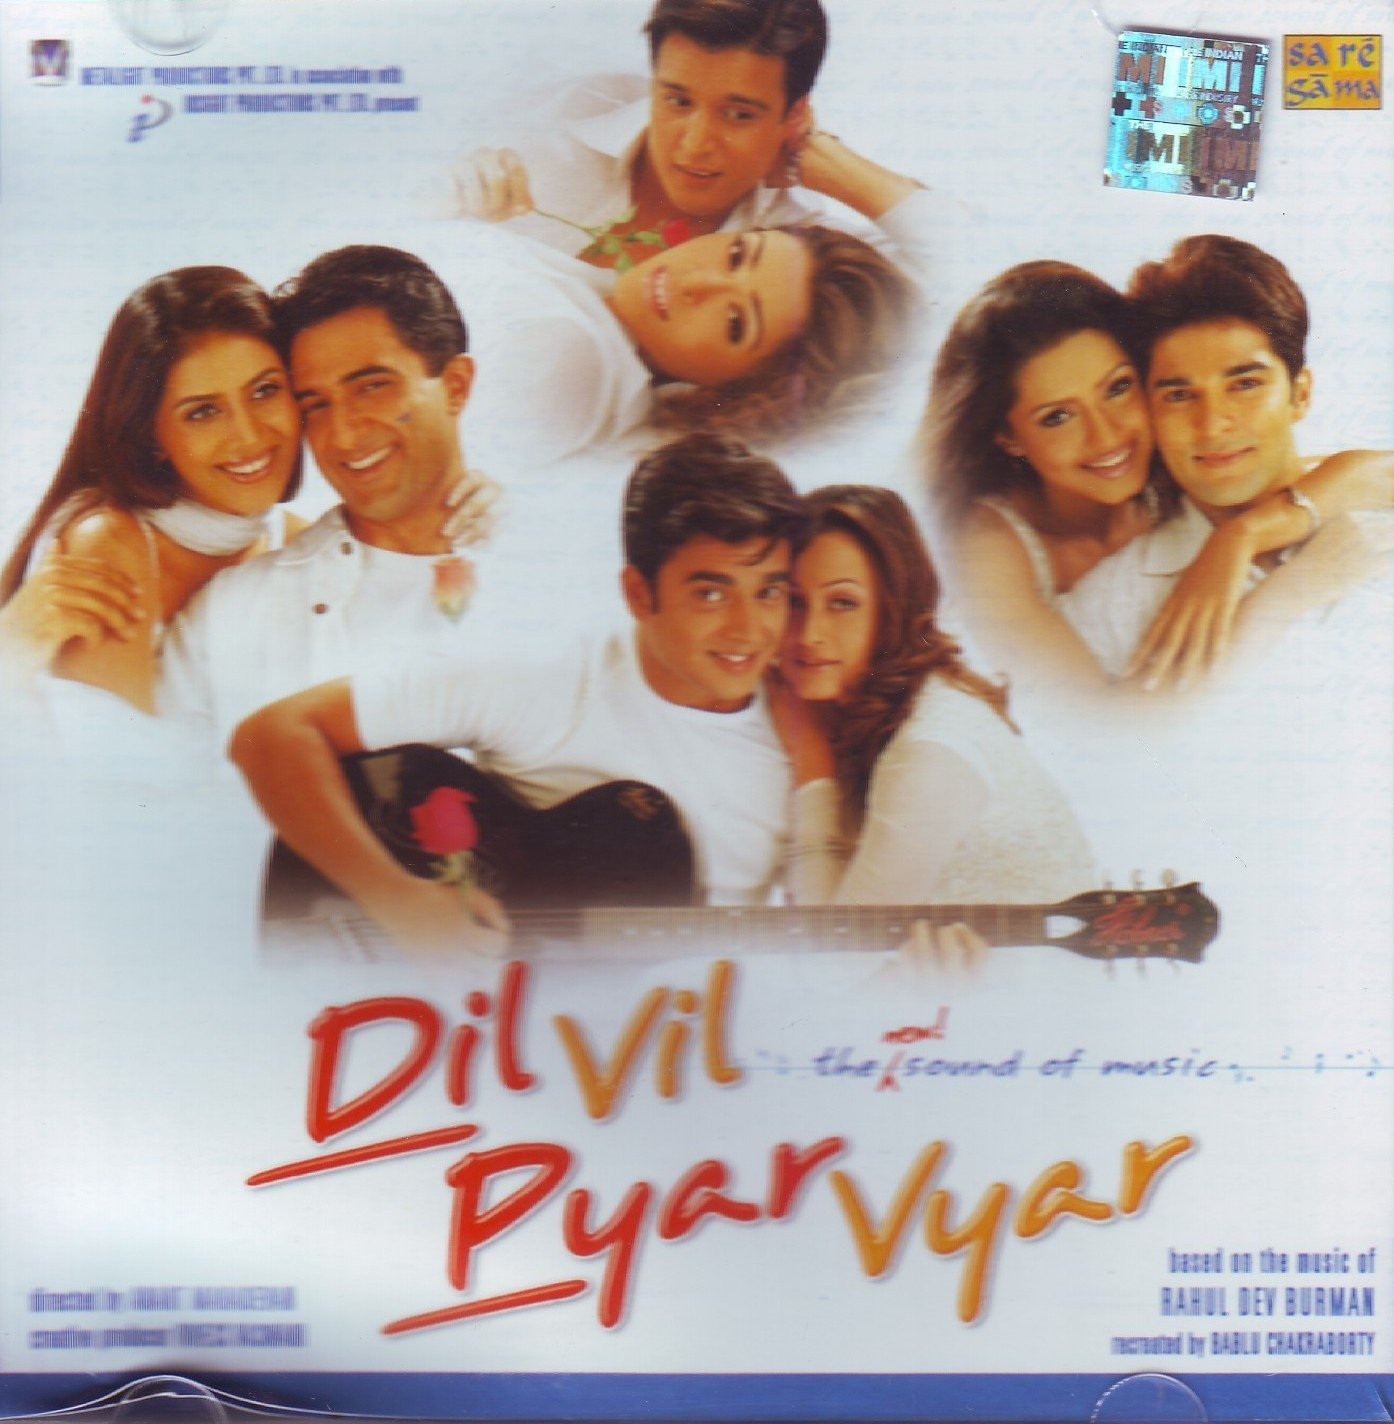 dil vil pyar vyar songs review music wallpapers songs